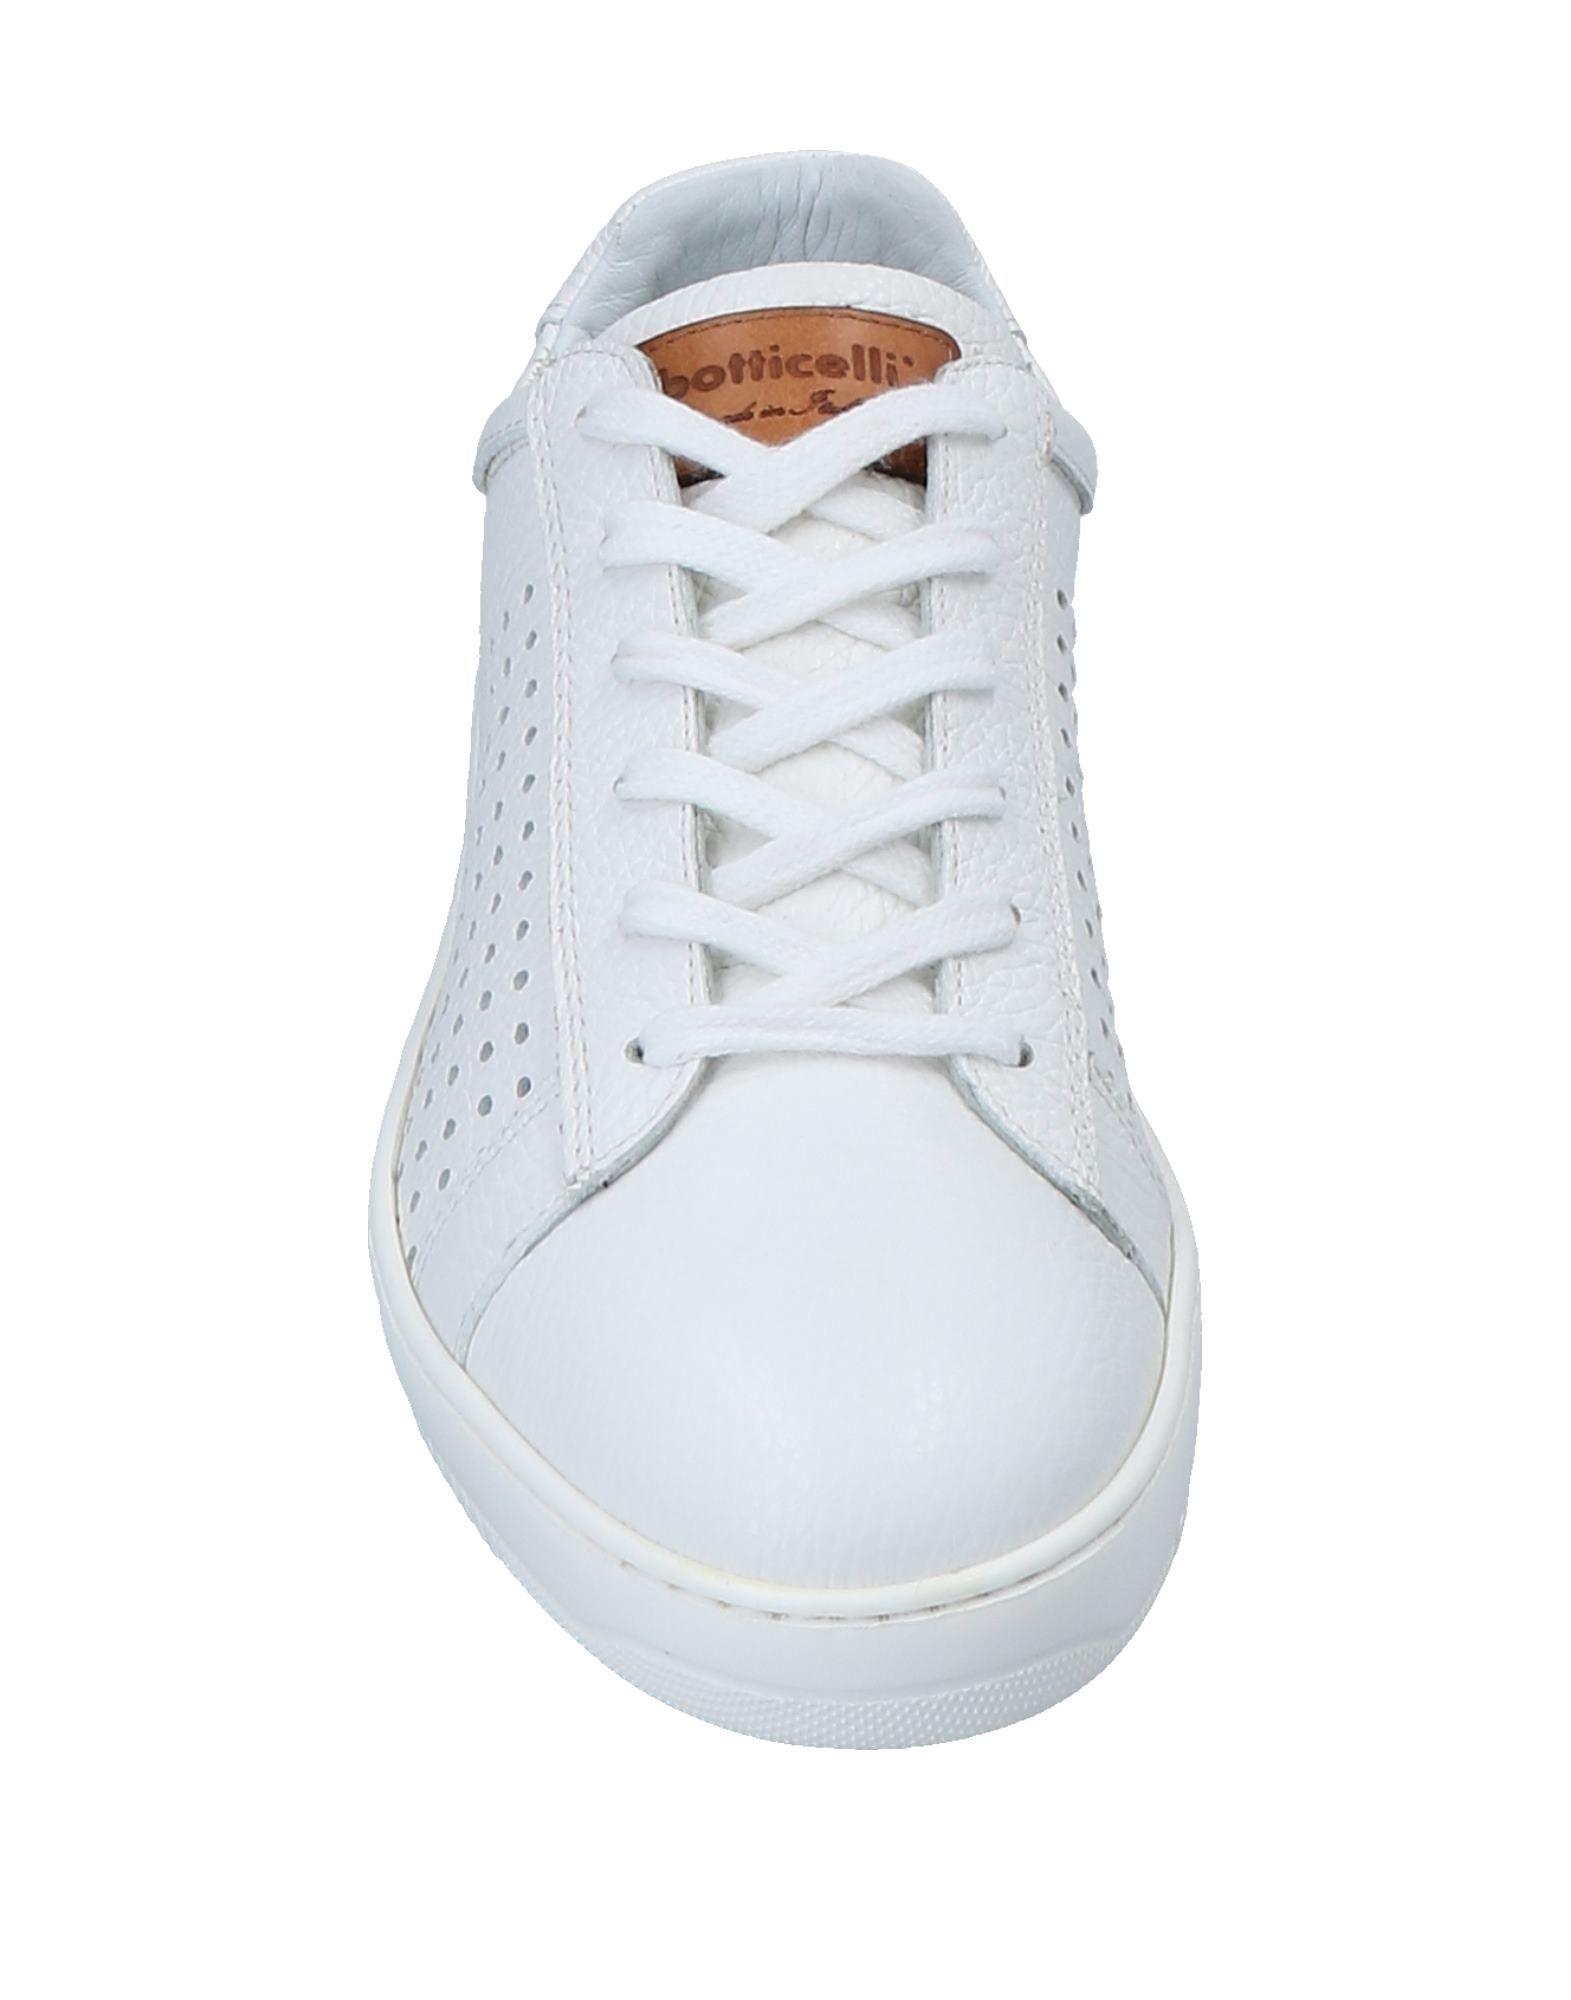 Roberto Botticelli Sneakers Herren  Schuhe 11554276CX Gute Qualität beliebte Schuhe  94910d